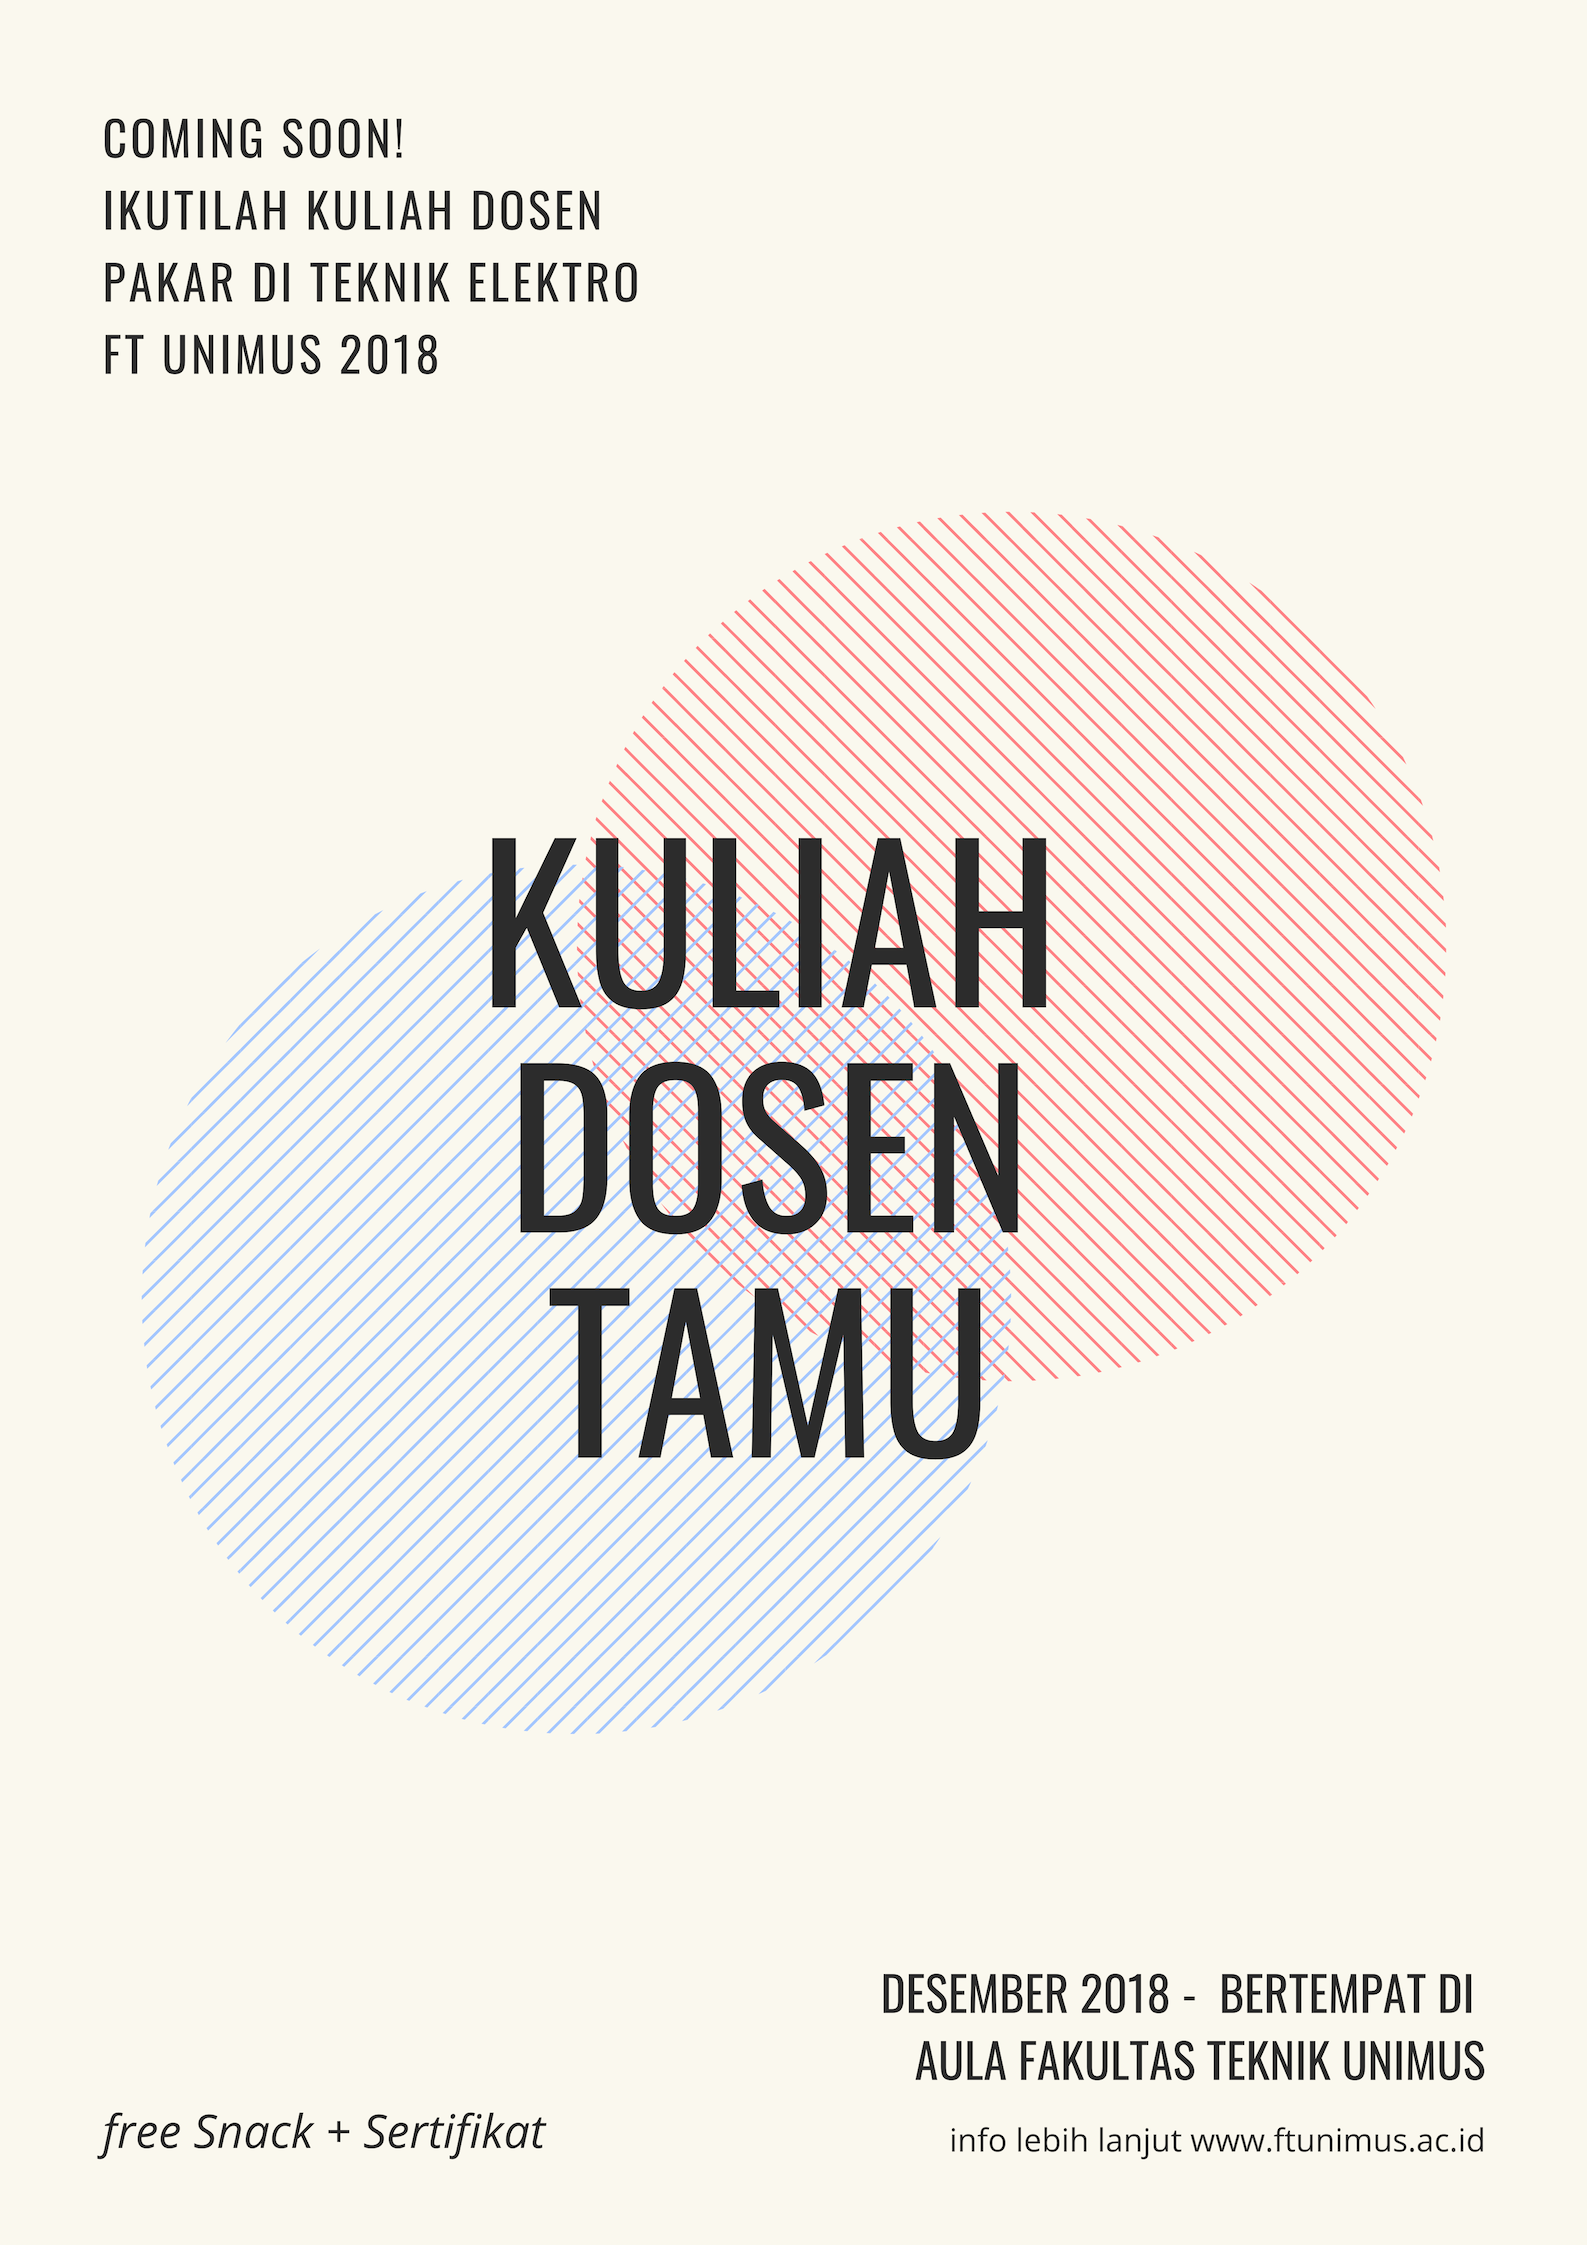 ComingSoon- Kuliah Dosen Pakar Teknik Elektro -Ft Unimus - Desember 2018